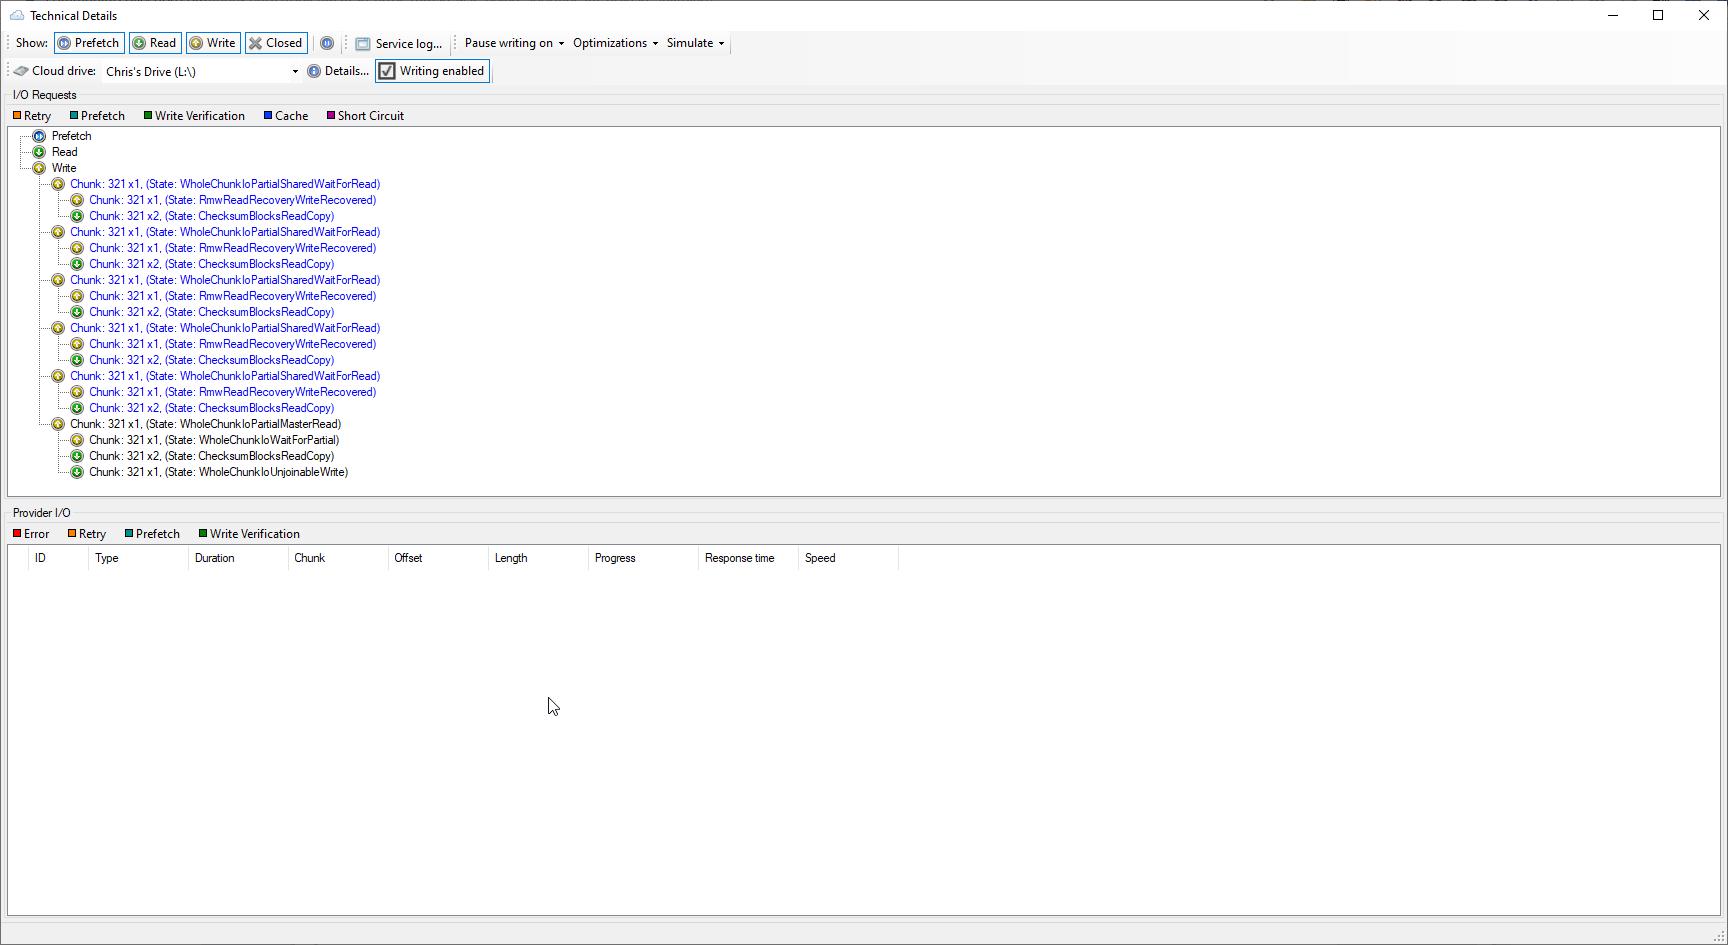 CloudDrive.UI_apo4vCUiMb.png